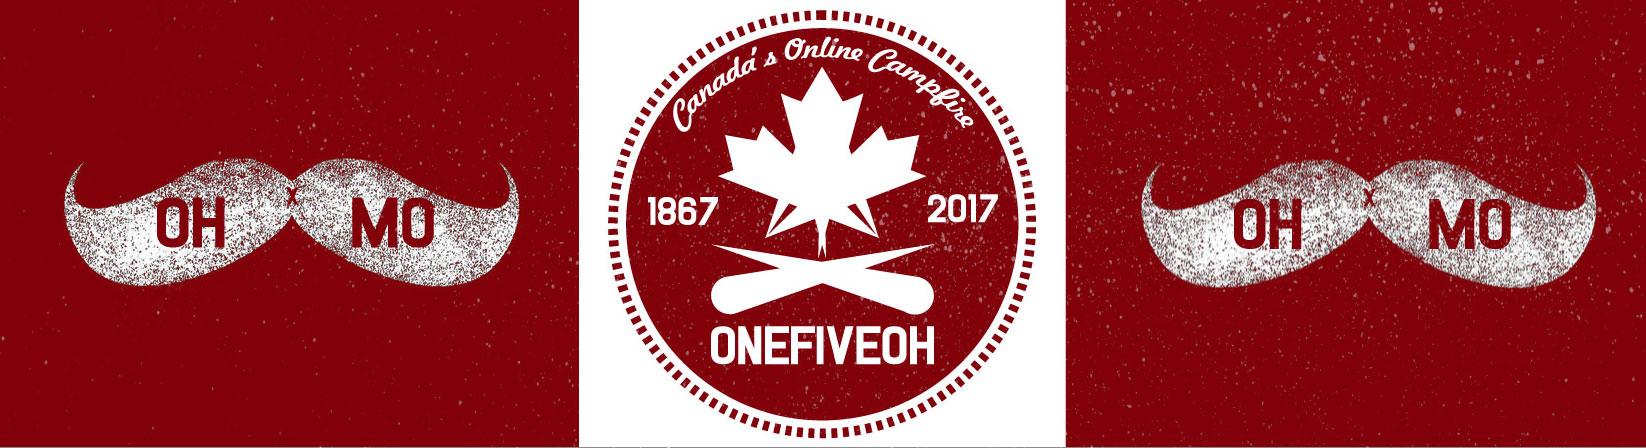 ONEFIVEOH-x-MOVEMBER.jpg